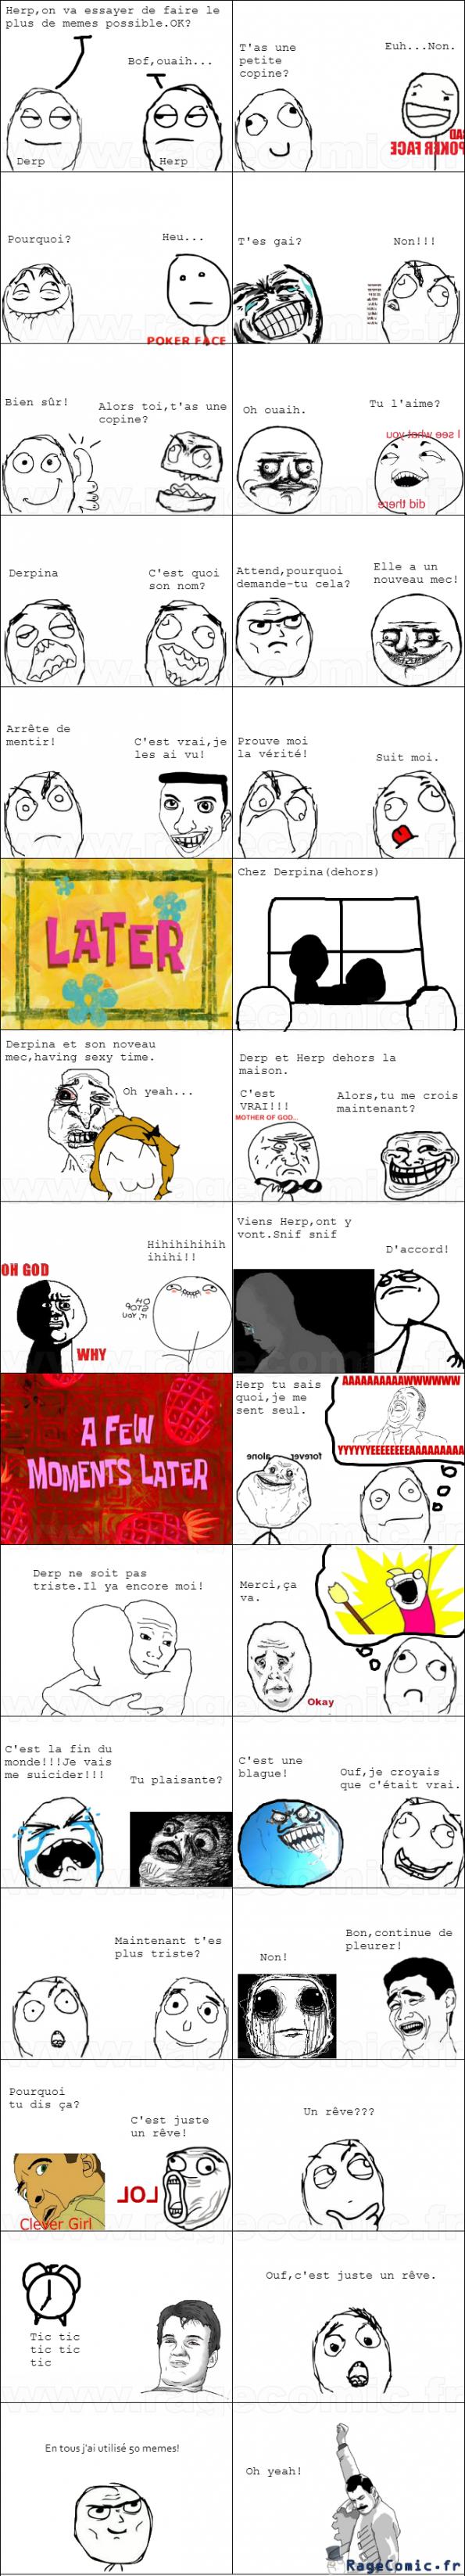 50 memes!